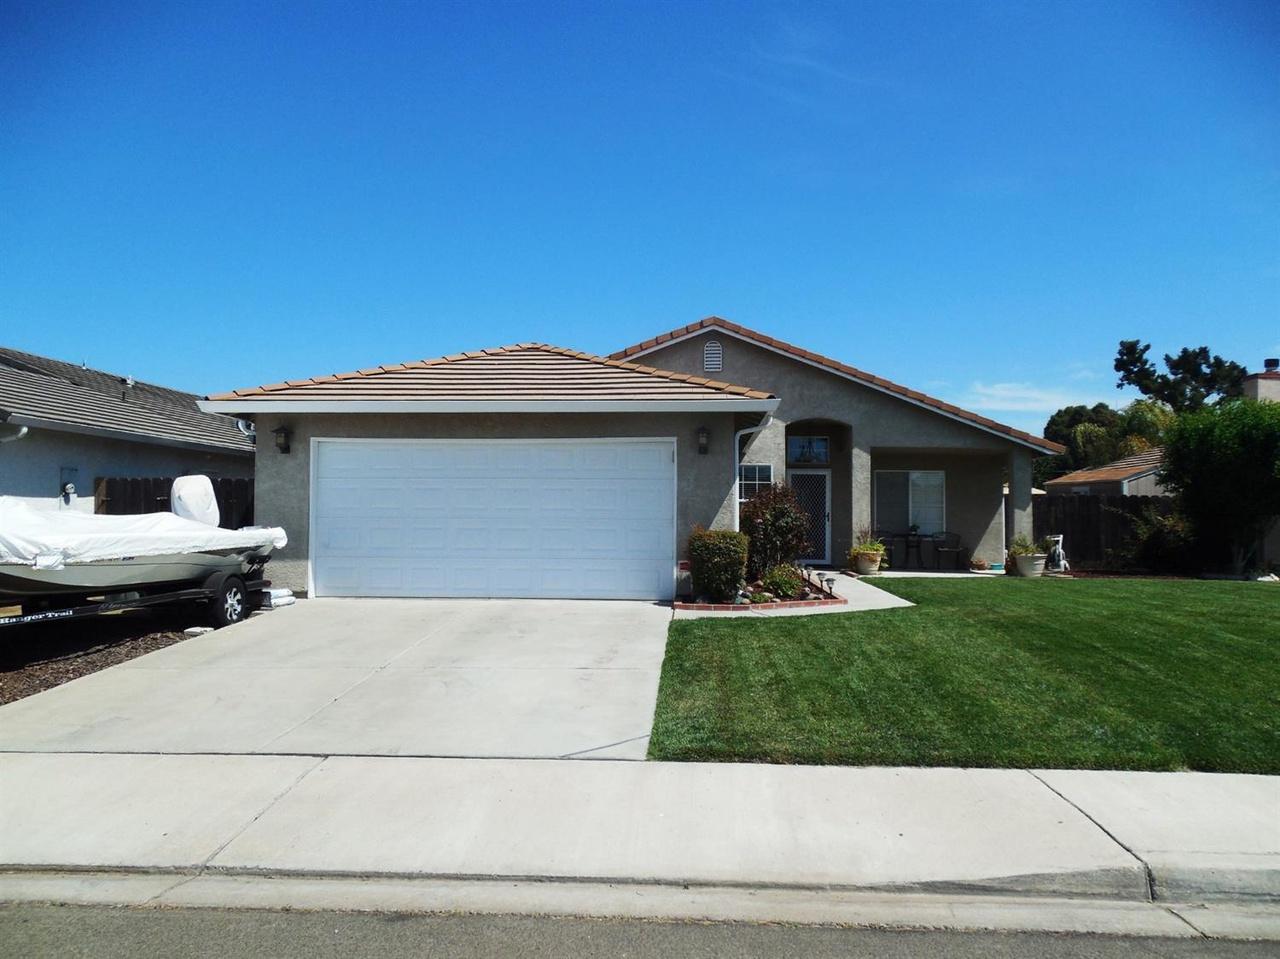 2217 Park East Dr, Modesto, CA 95351   MLS# 18033290   Redfin